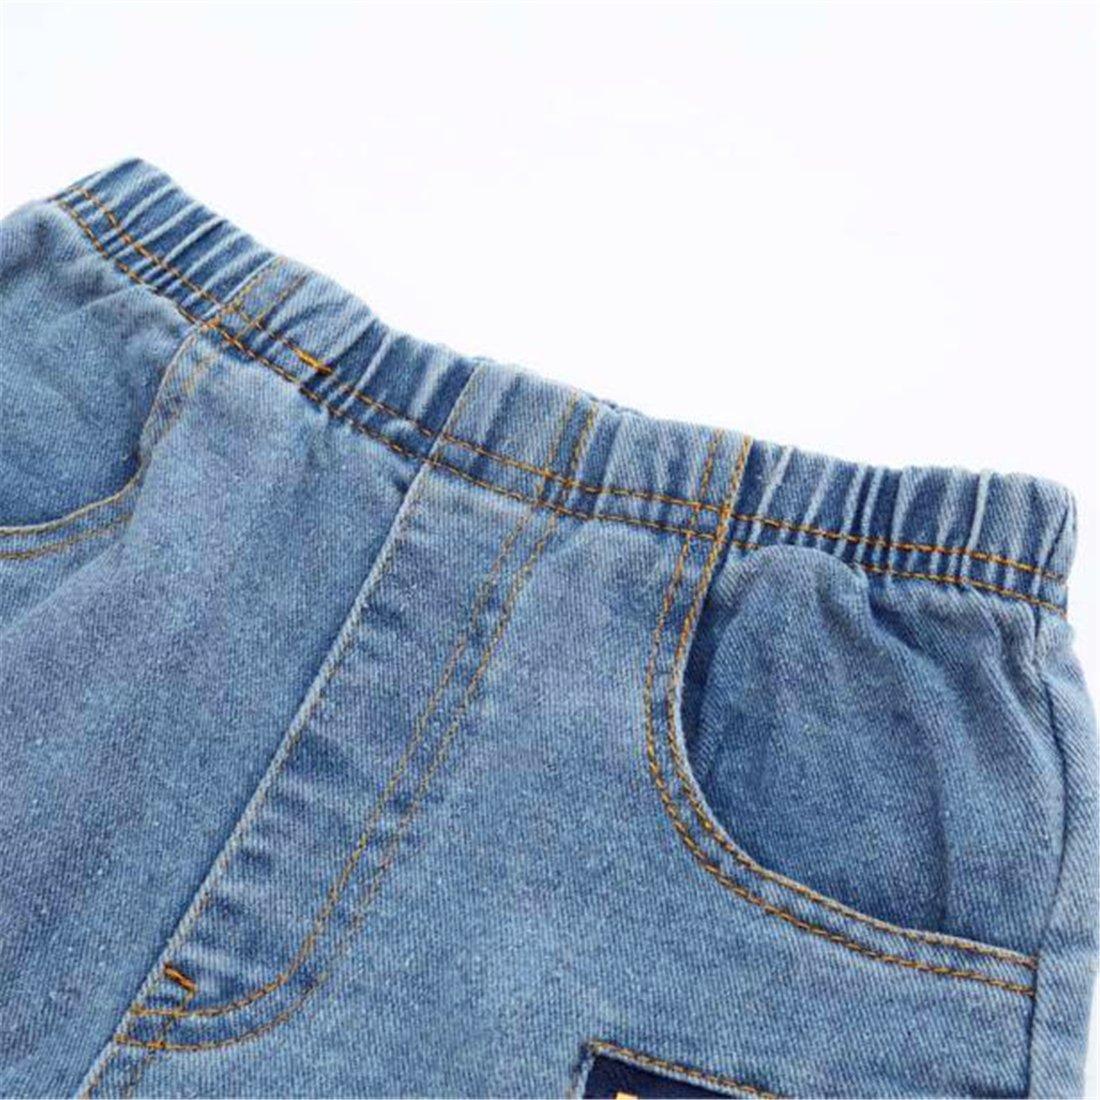 HANYI The Boy Zipper Stretch Slim Pale Denim Jeans Trousers Pants HANYI-00167